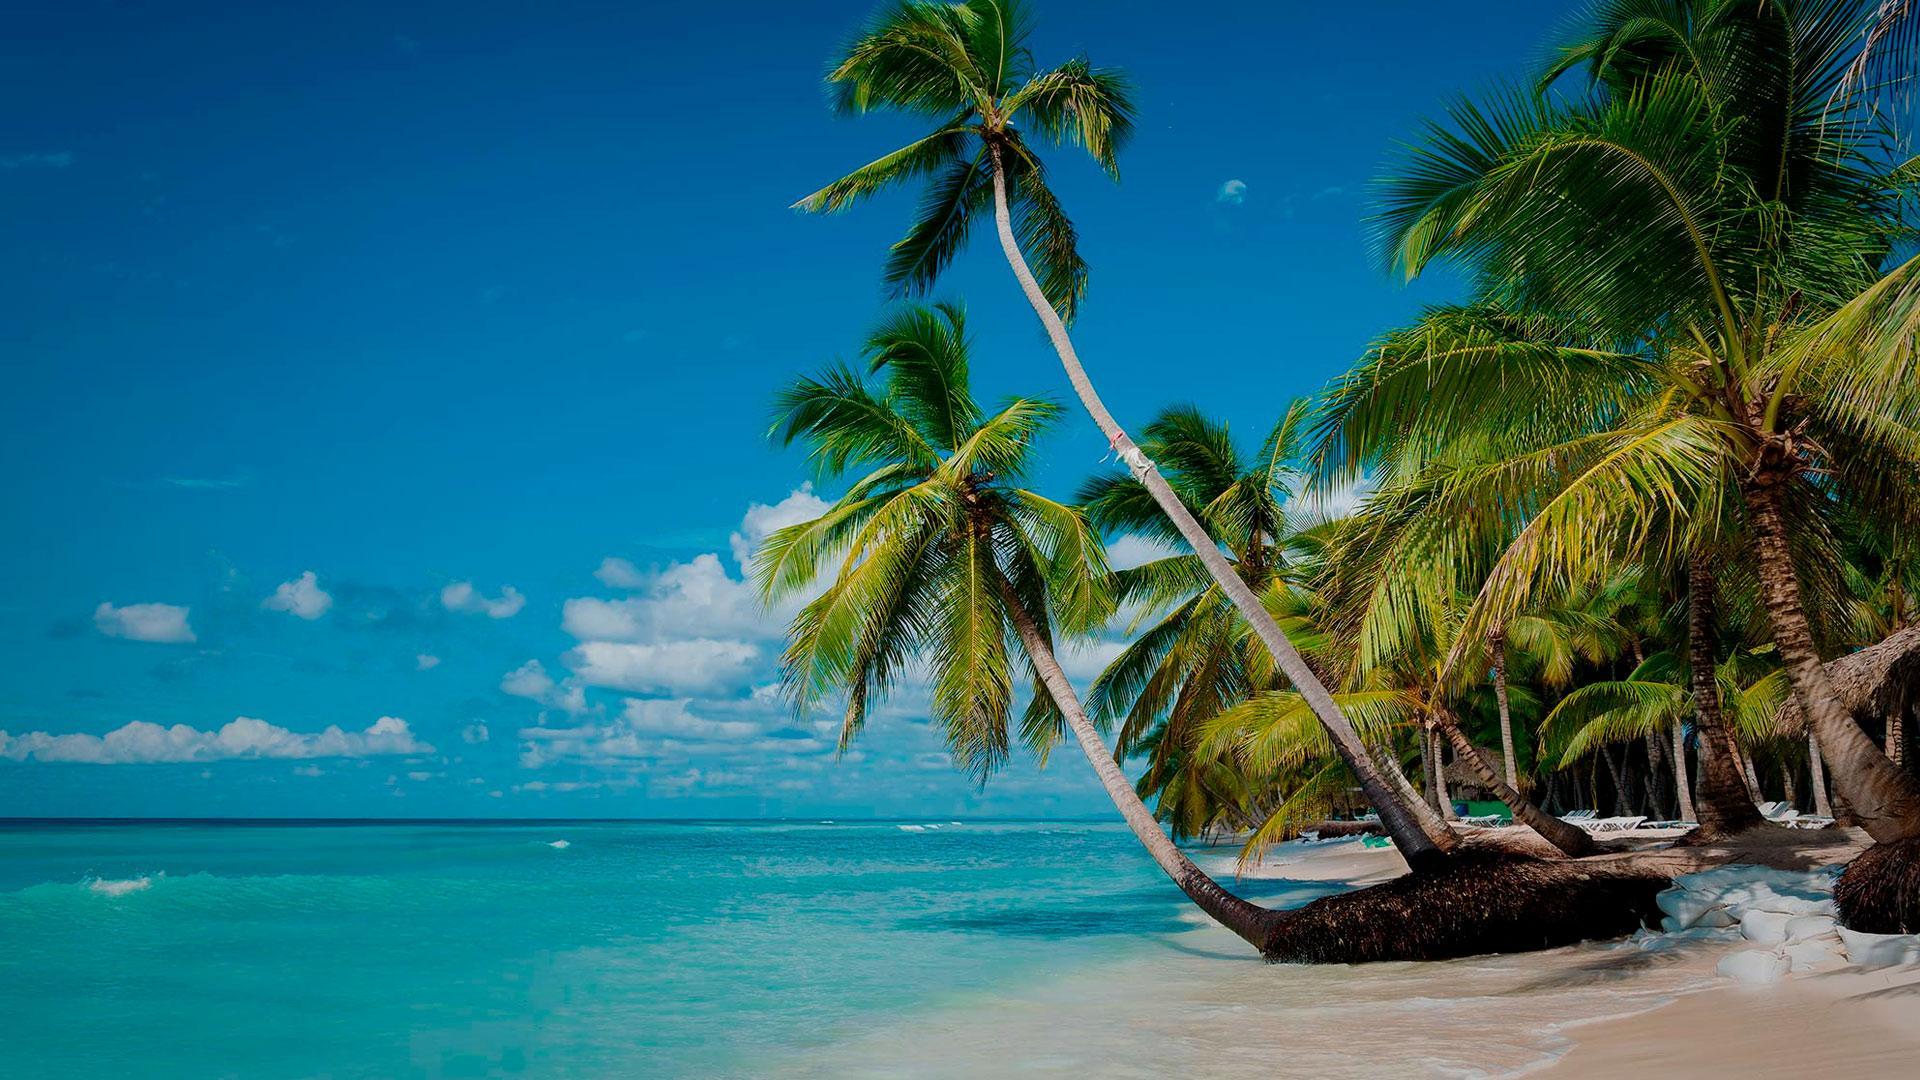 https://www.centraldevacaciones.com/viajes/assets/upload/d2298.jpg